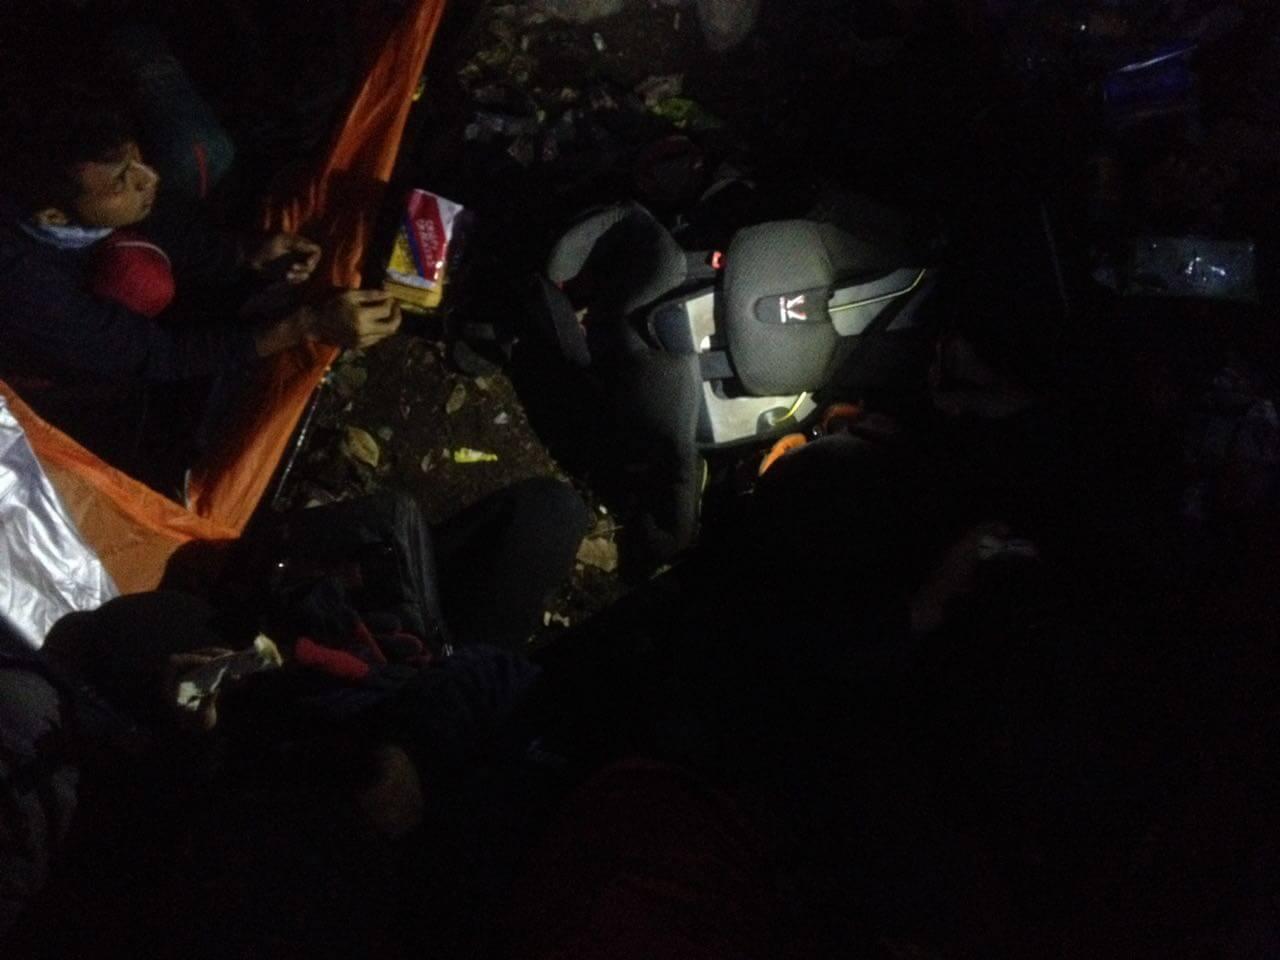 Suasana Camp Pos 4 Ciremai via Apuy / Tegal Jamuju (Foto oleh : @afvendiant)